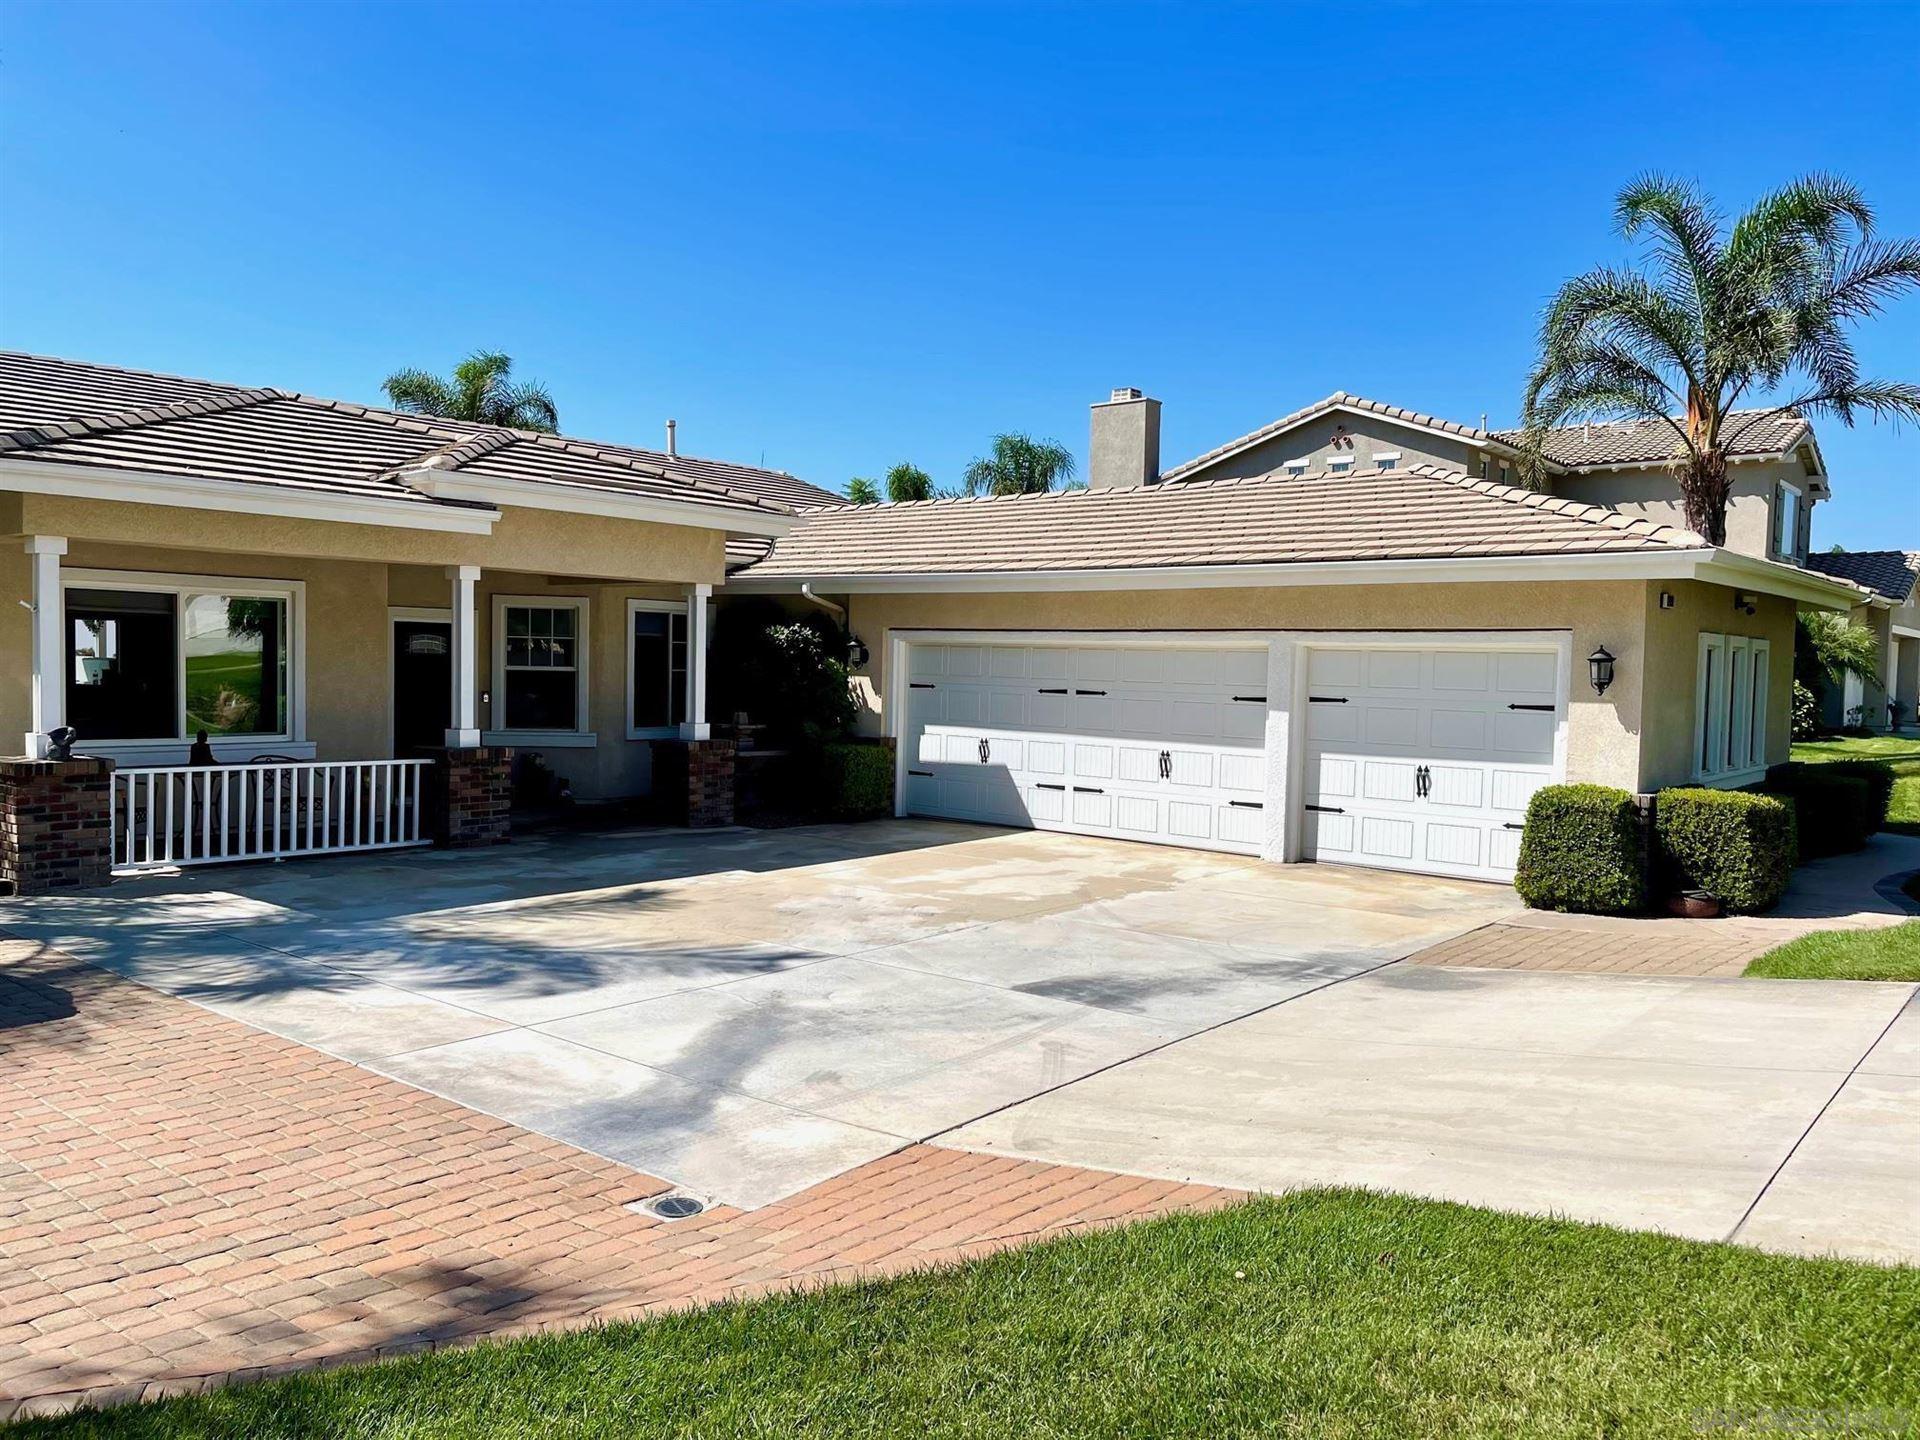 Photo of 12693 Ridgecrest Drive, Rancho Cucamonga, CA 91739 (MLS # 210026631)